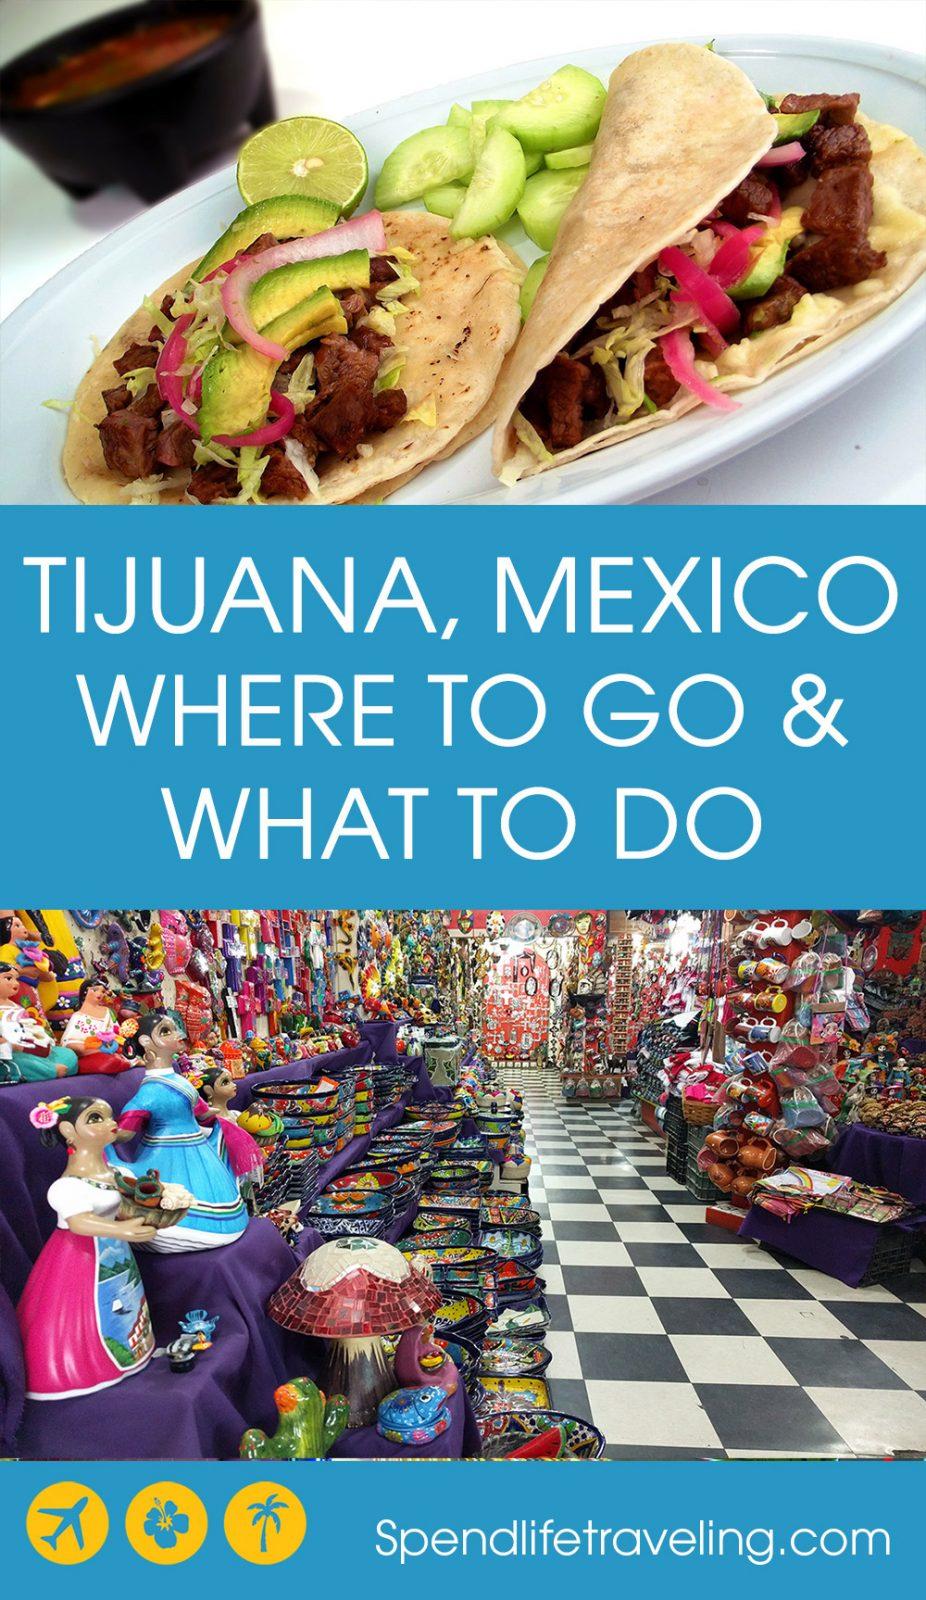 #Tijuana, Mexico: Where to go & What to do